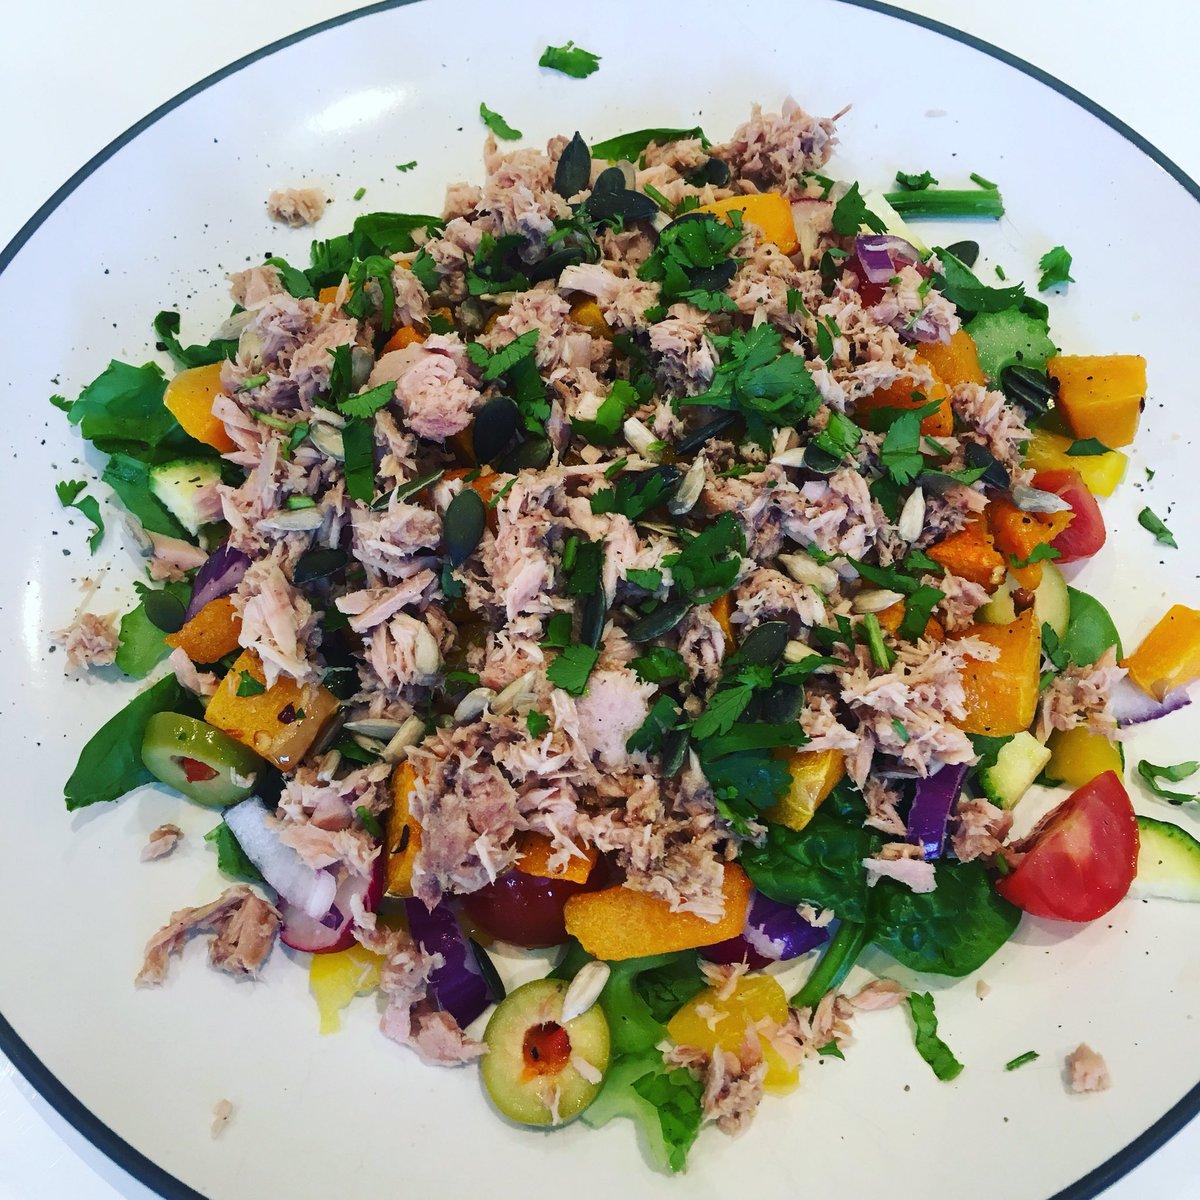 #Lunch - tuna, roasted butternut squash, mixed salad 🥗 https://t.co/wnqgH7EL3A